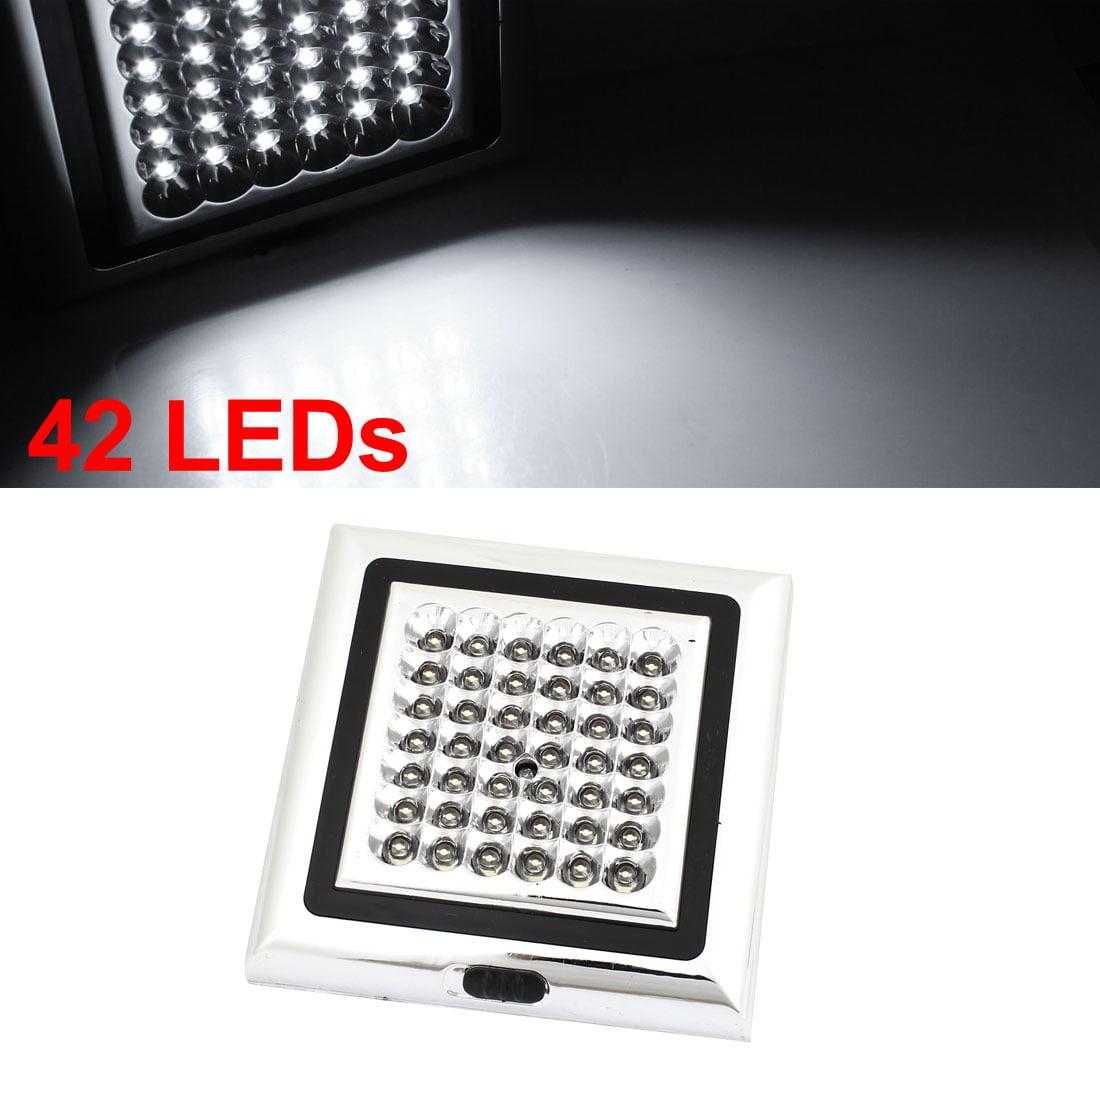 Unique Bargains Silver Tone Shell White 42 LED 3 Settings Interior Light Lamp 12V for Car 12V